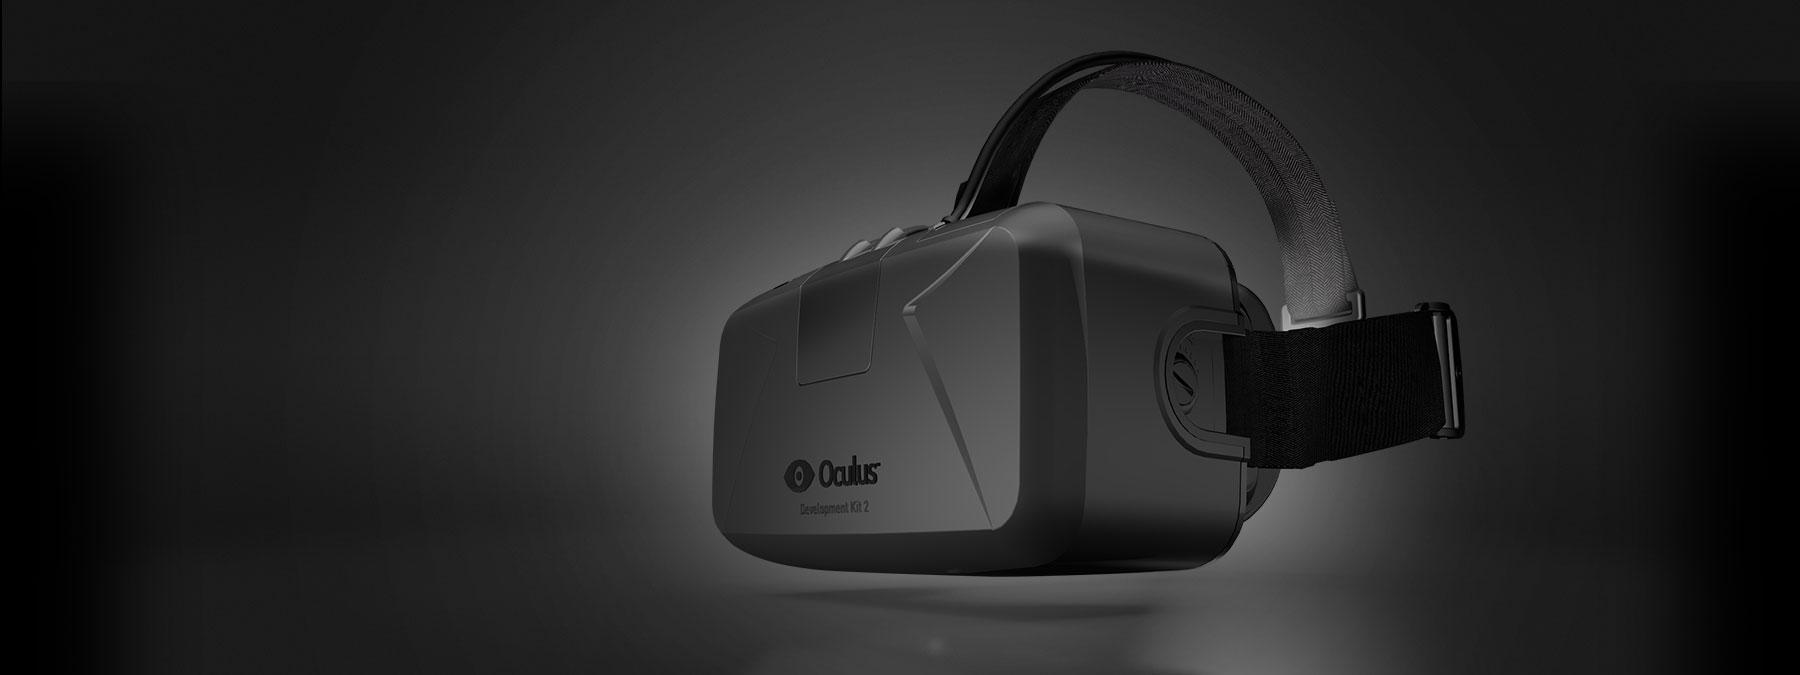 OculusVR startet DK2-Verkauf